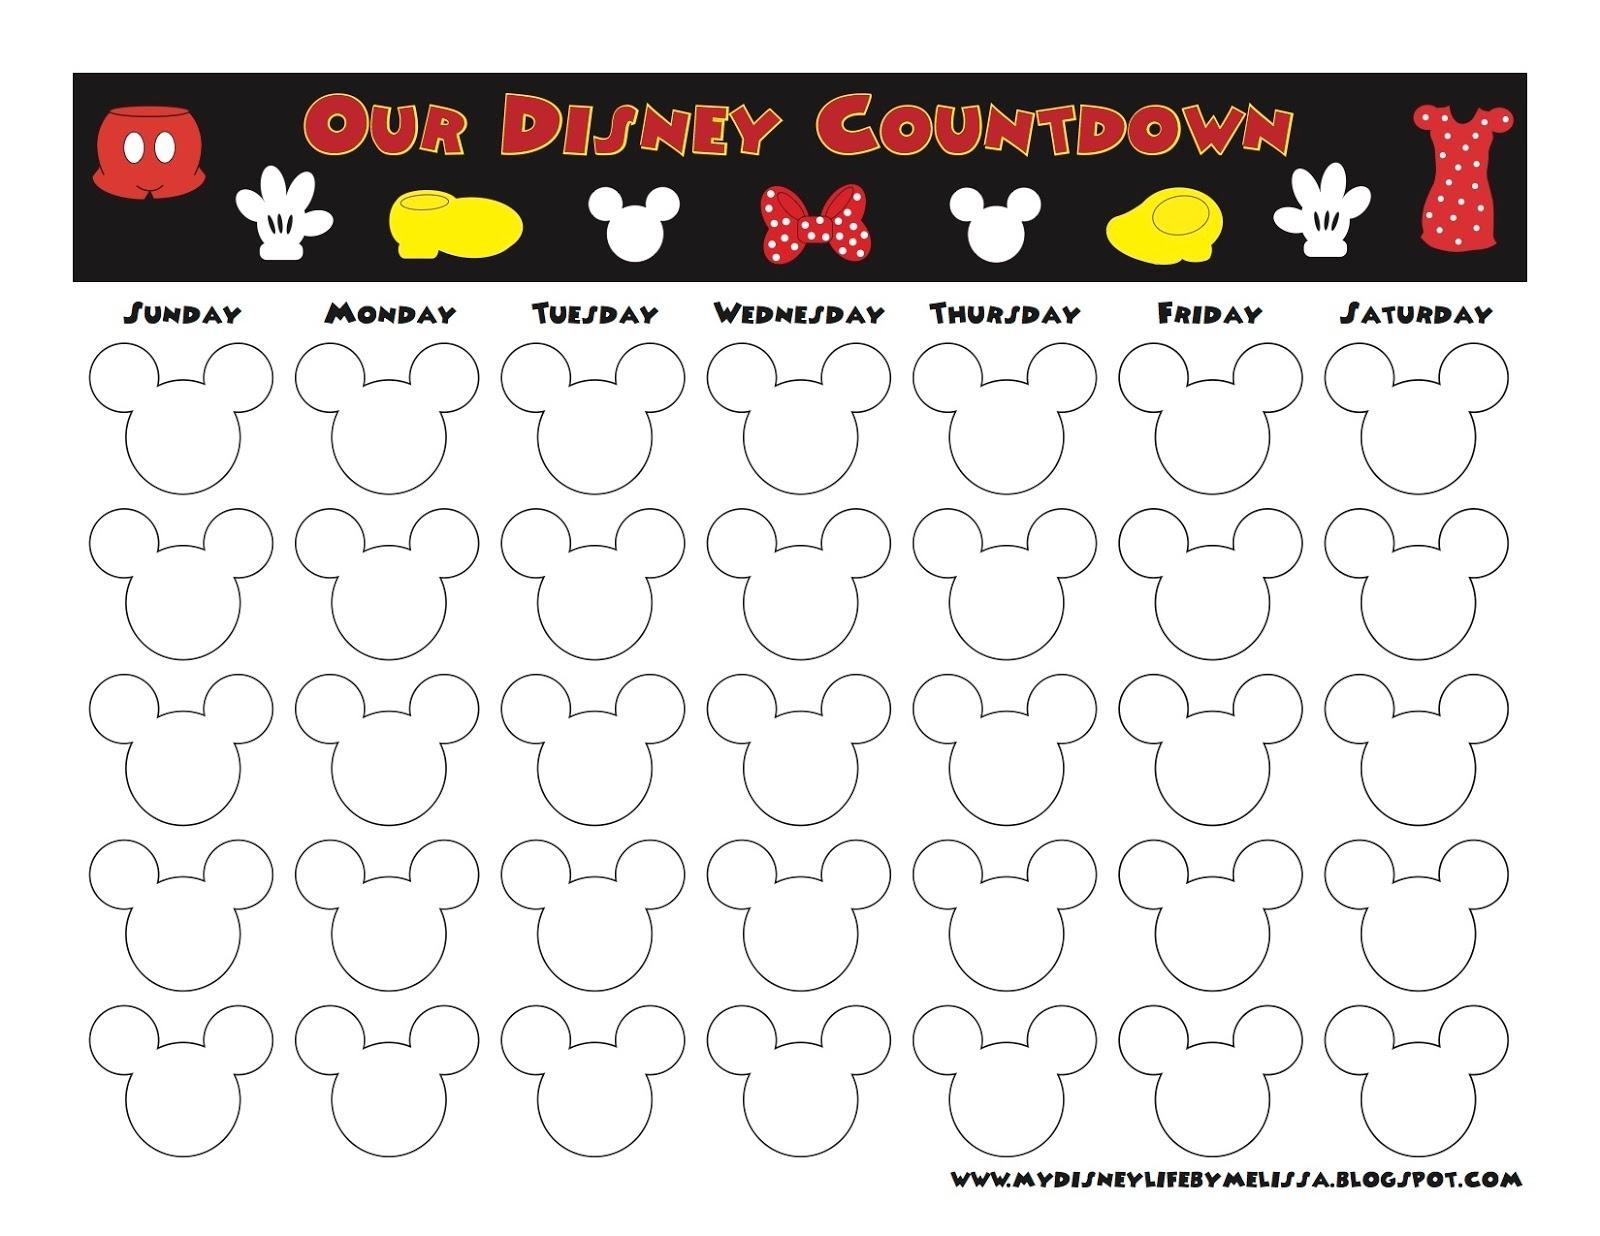 My Disney Life: Countdown Calendars regarding Disney Printable Calendars By Month